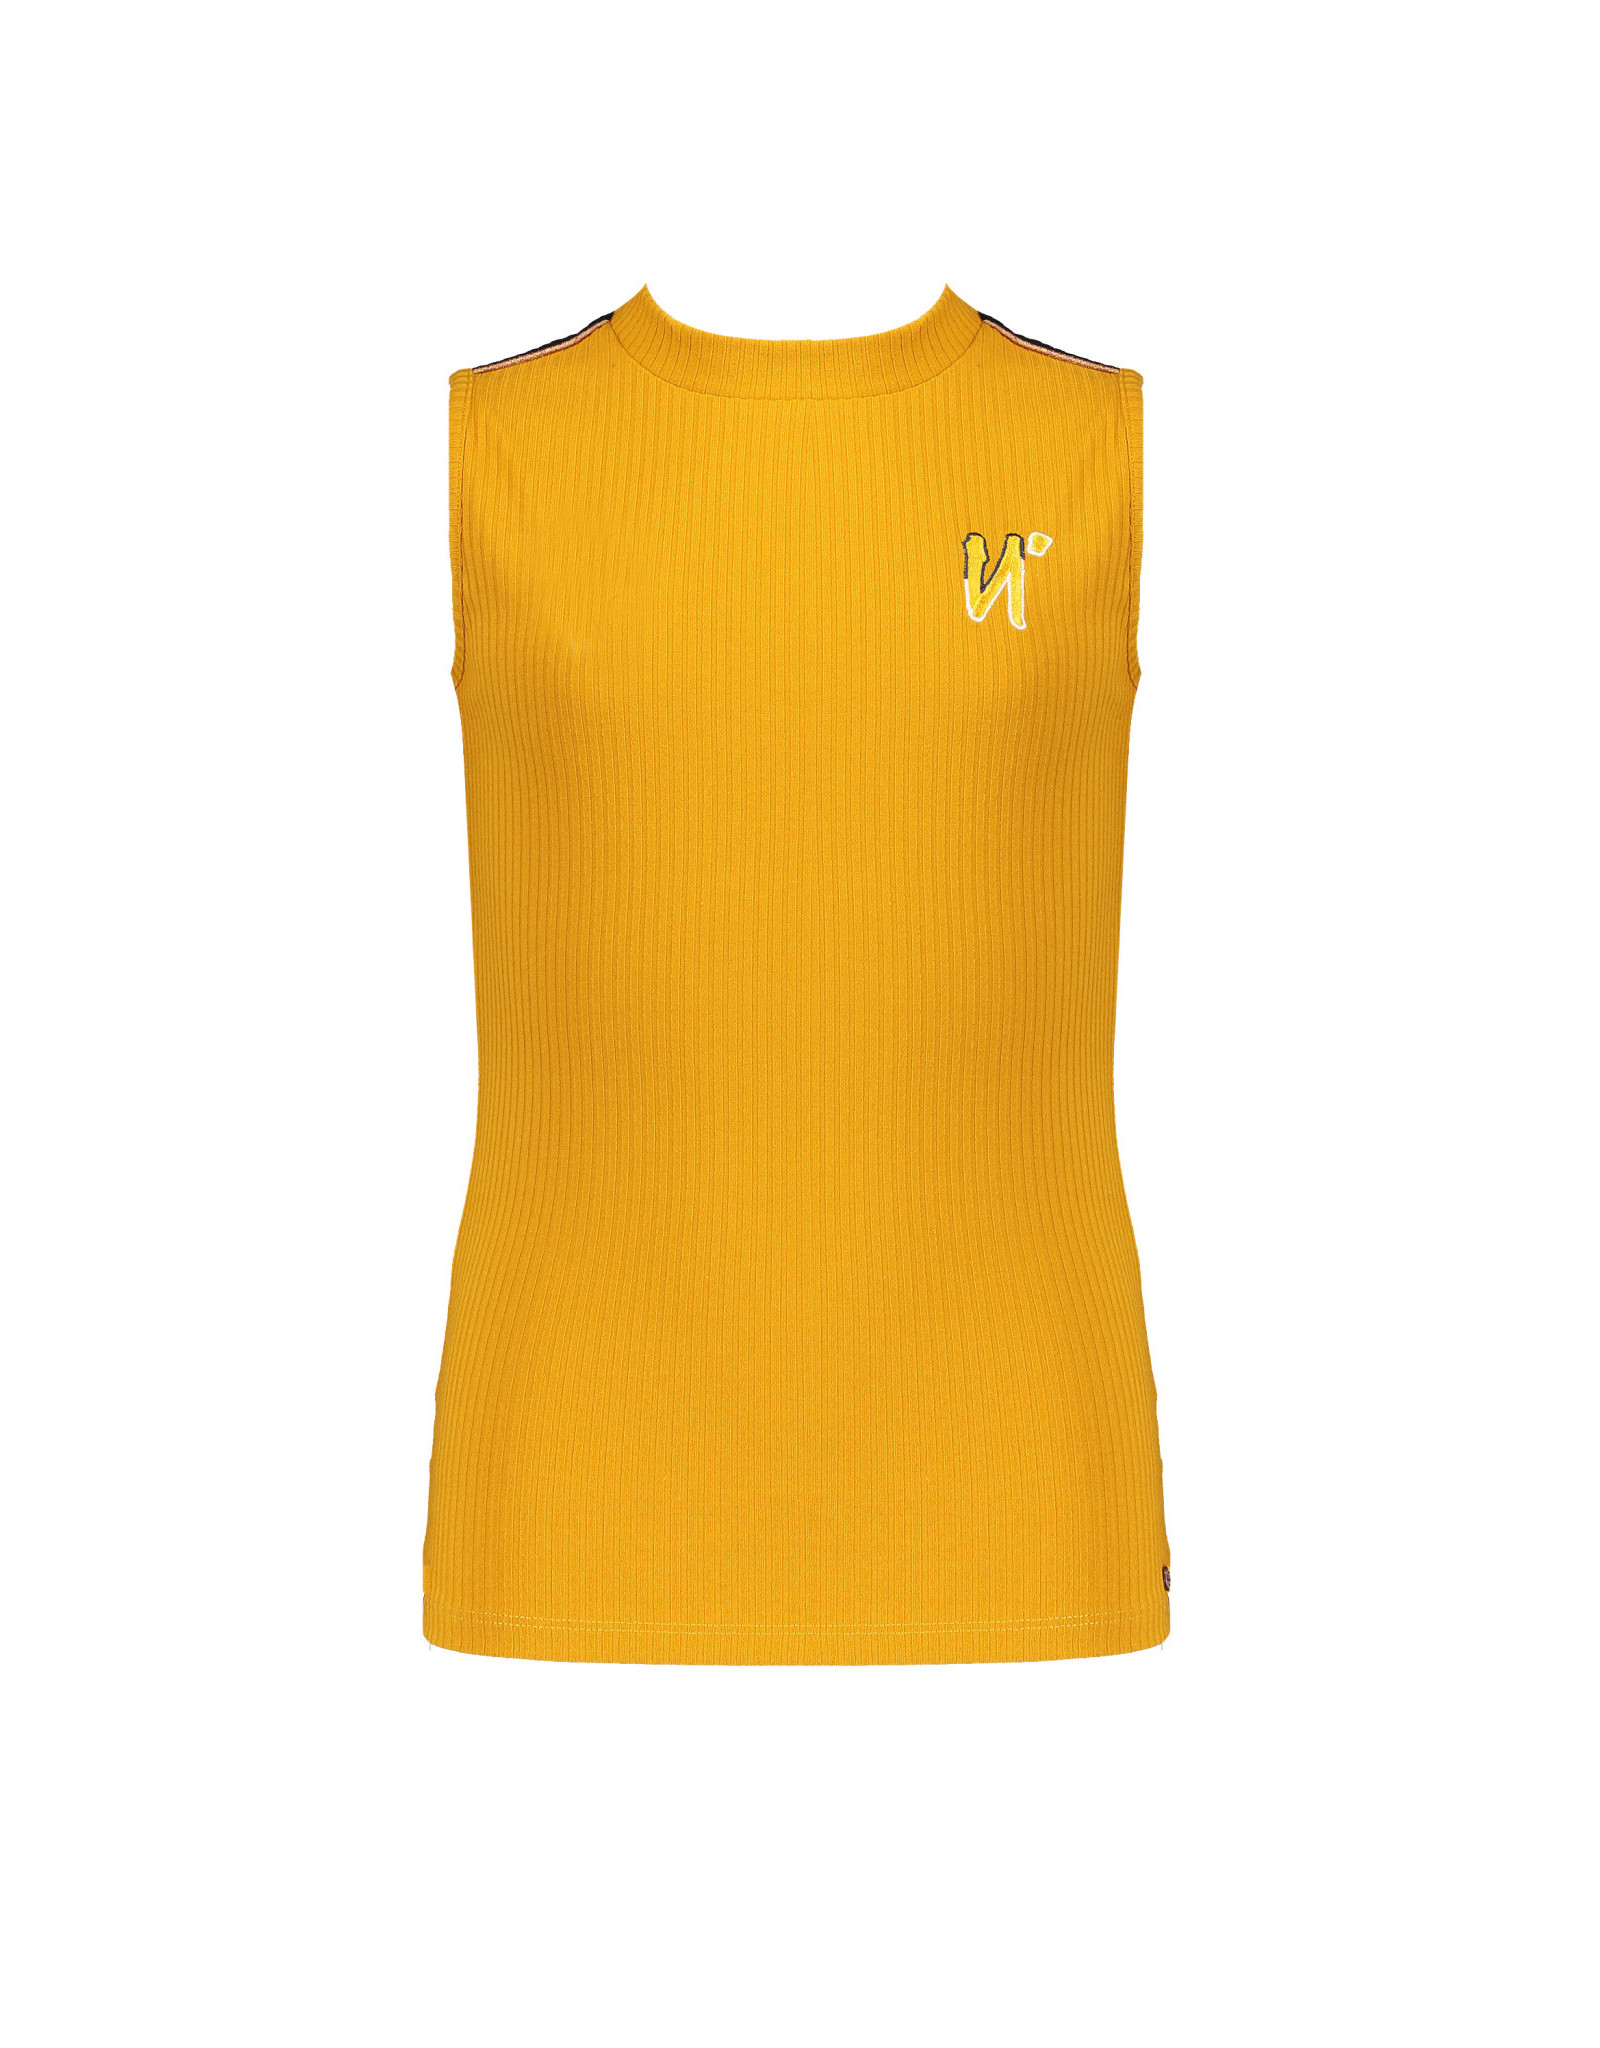 NoBell meiden jersey top Kiev Safari Gold